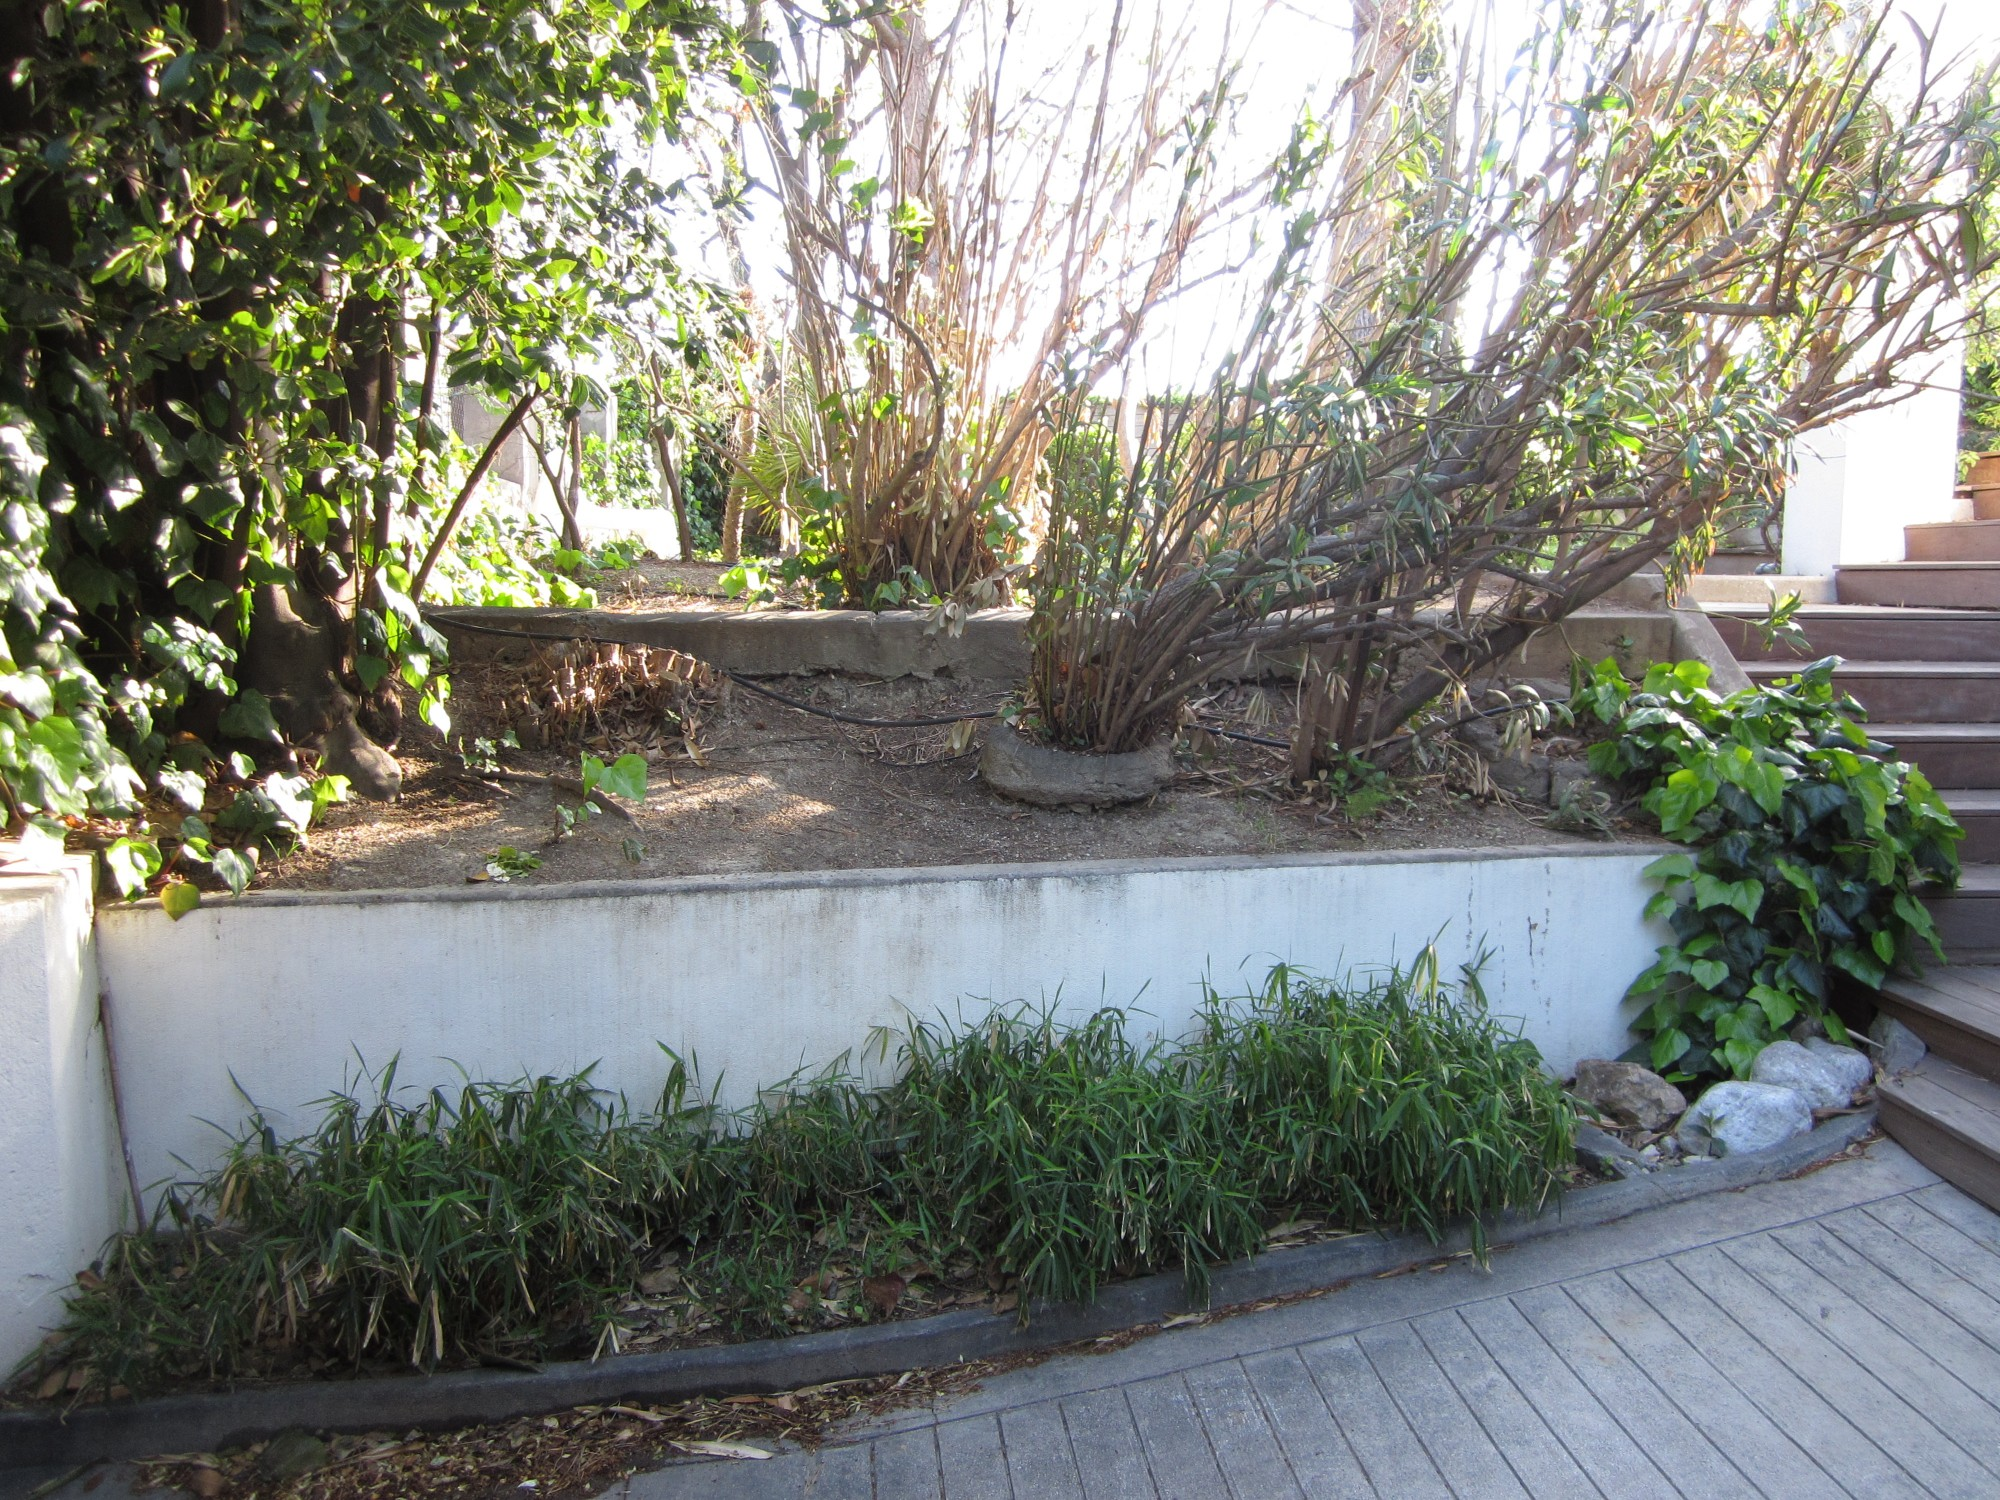 Am nagement paysager de jardin sec marseille vert tige for Photo de jardin paysager